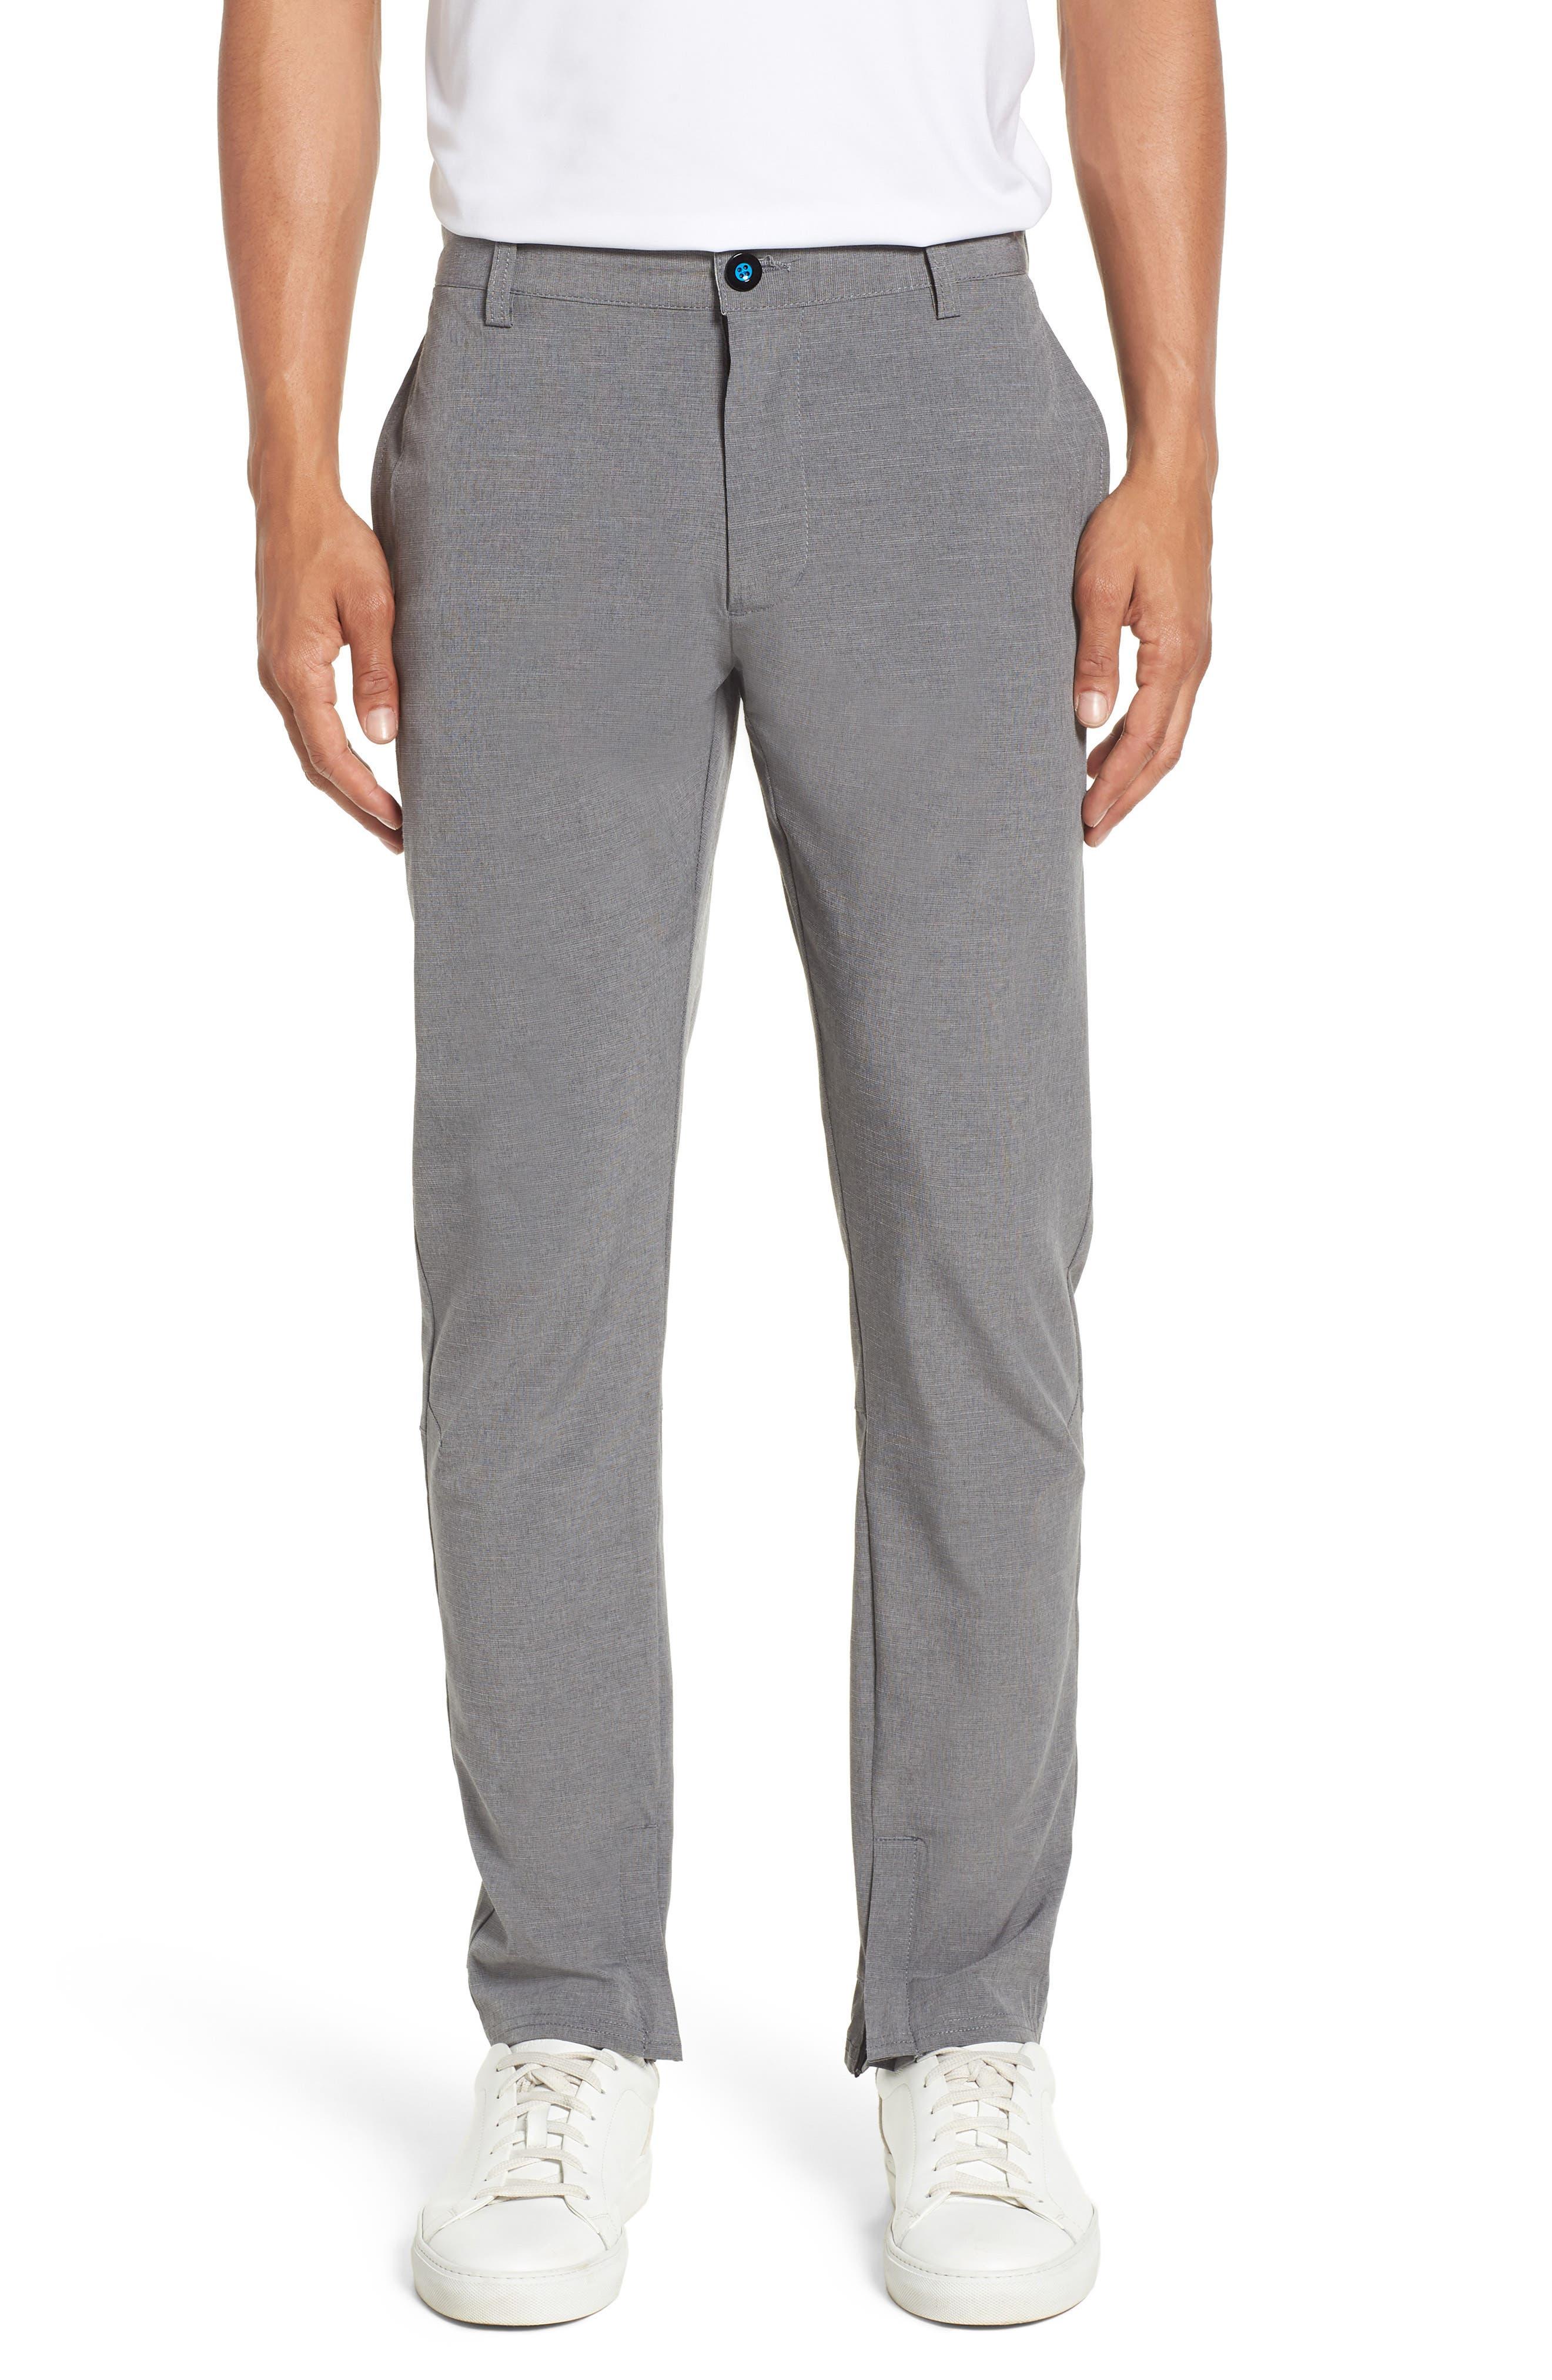 Gravity Athletic Fit Pants,                         Main,                         color, CHARCOAL